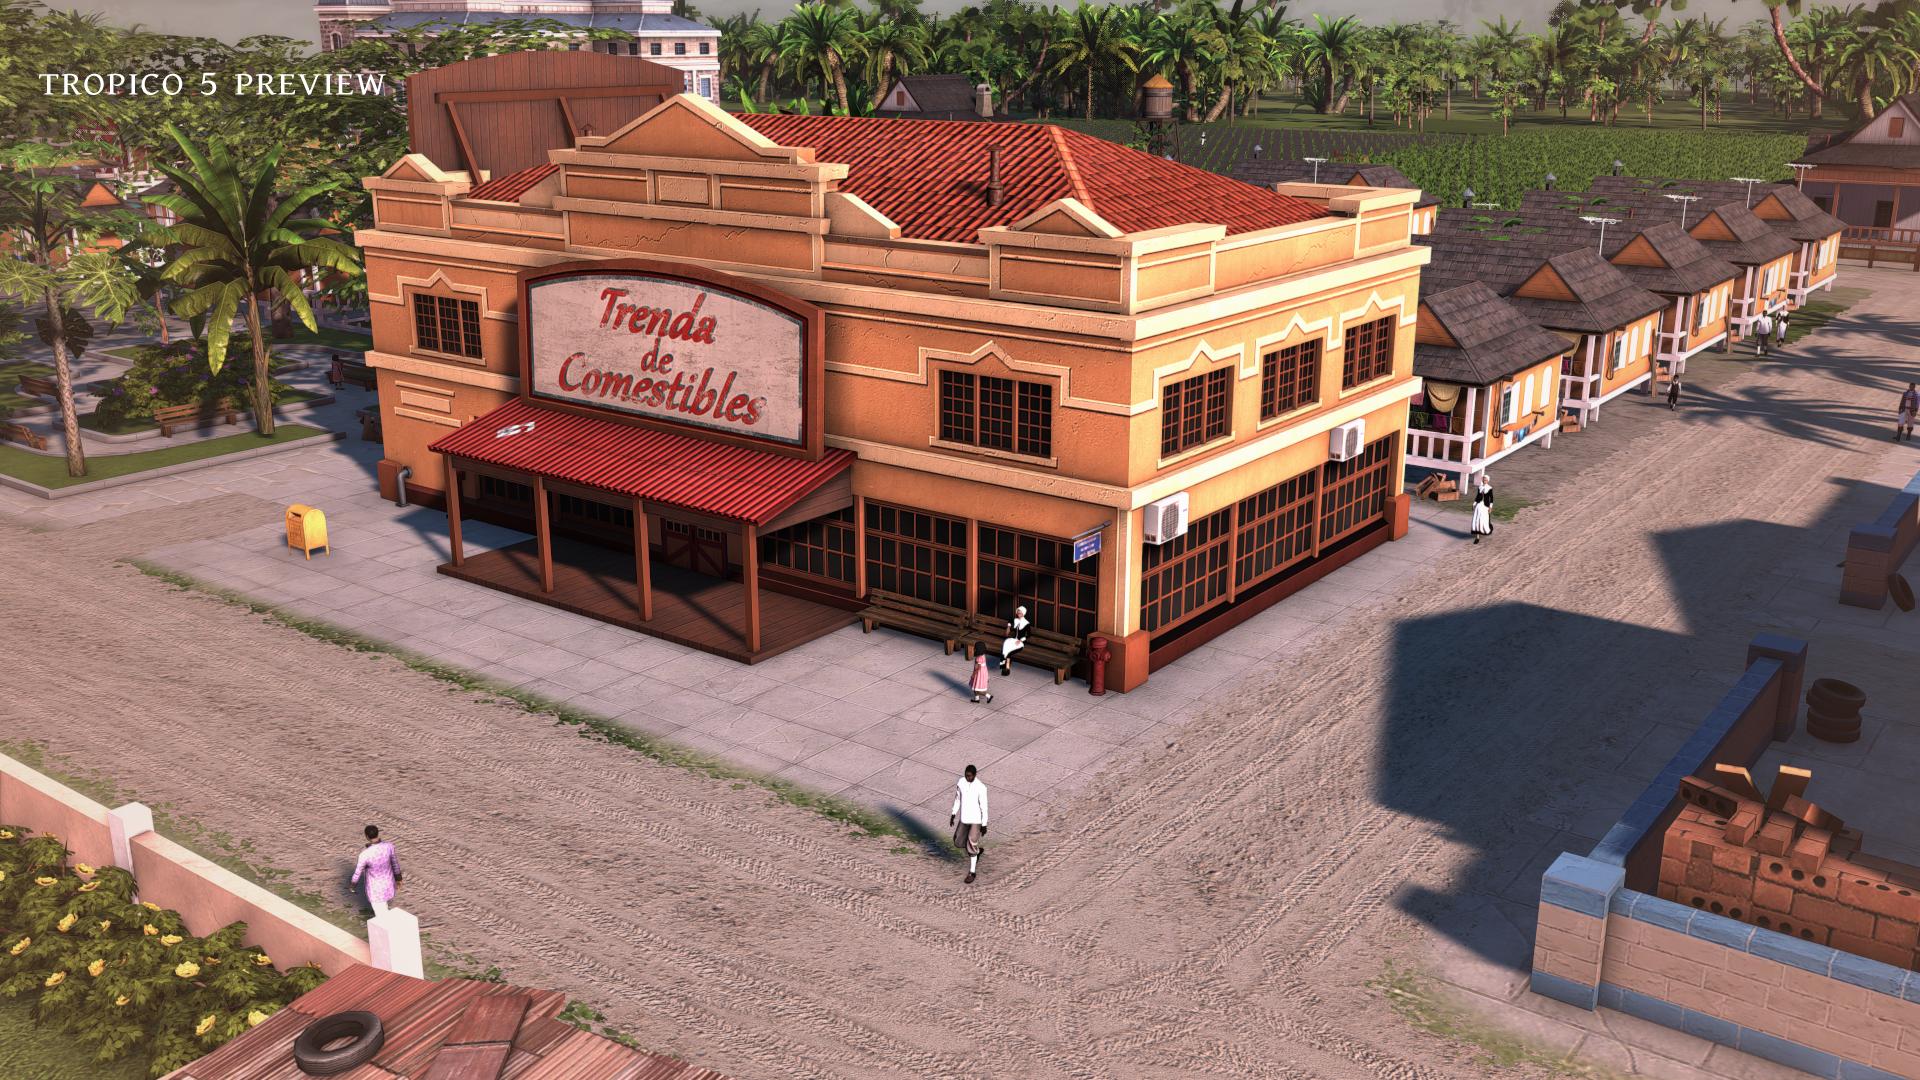 Tropico 6: Trailer zeigt Weltwunder, Fans kritisieren Grafik 4